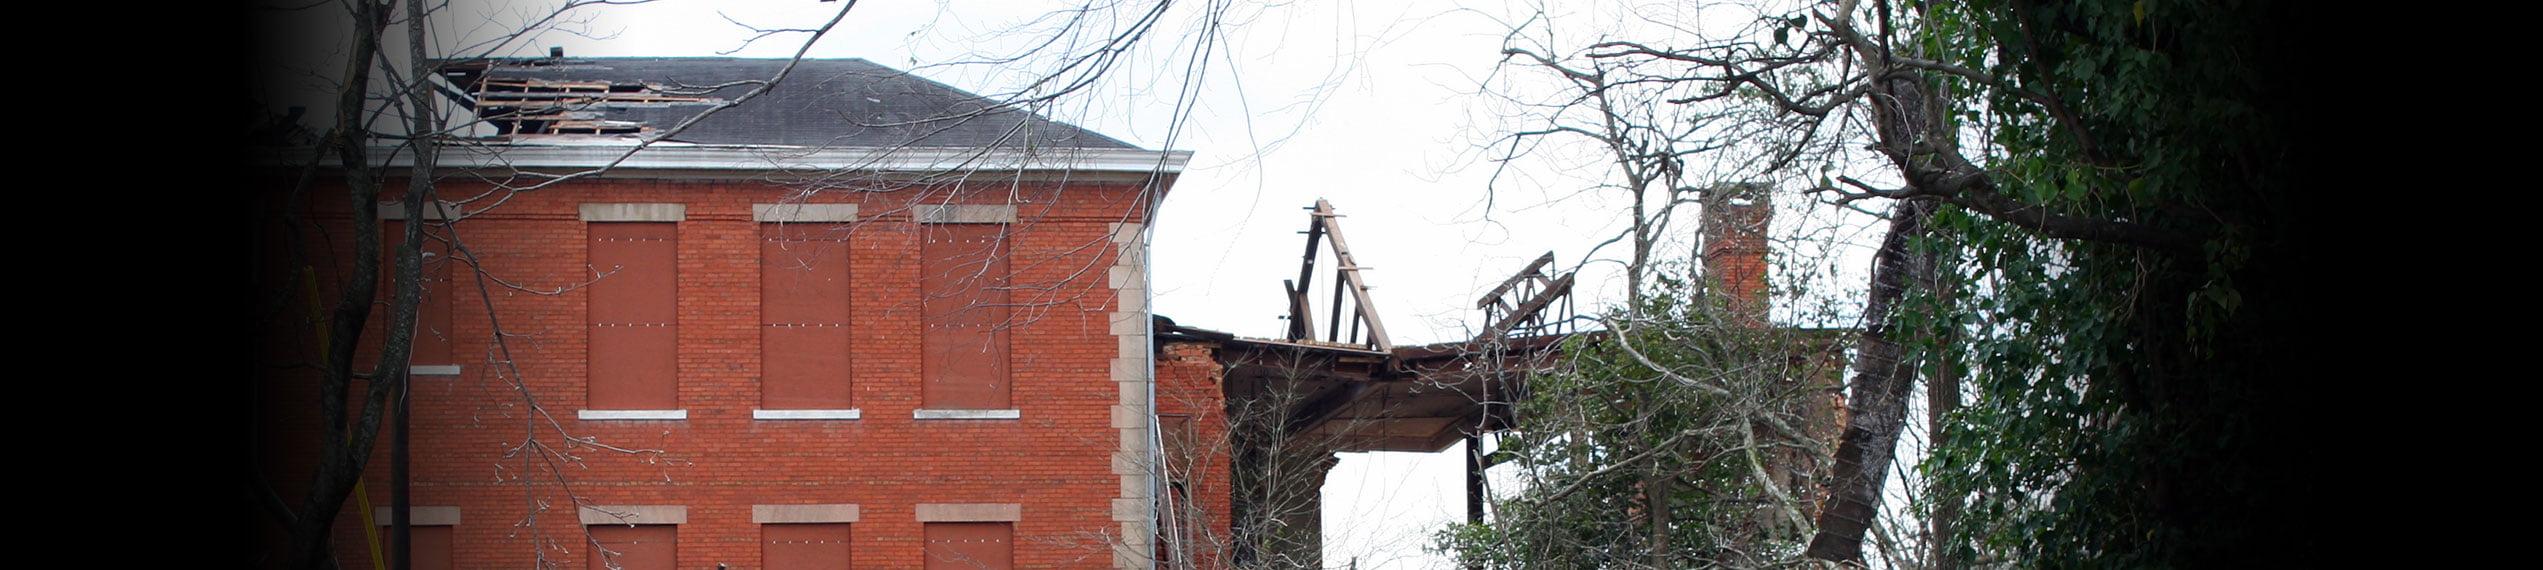 Wind & Storm Damage Repairs in Paul Davis Restoration of West Richmond